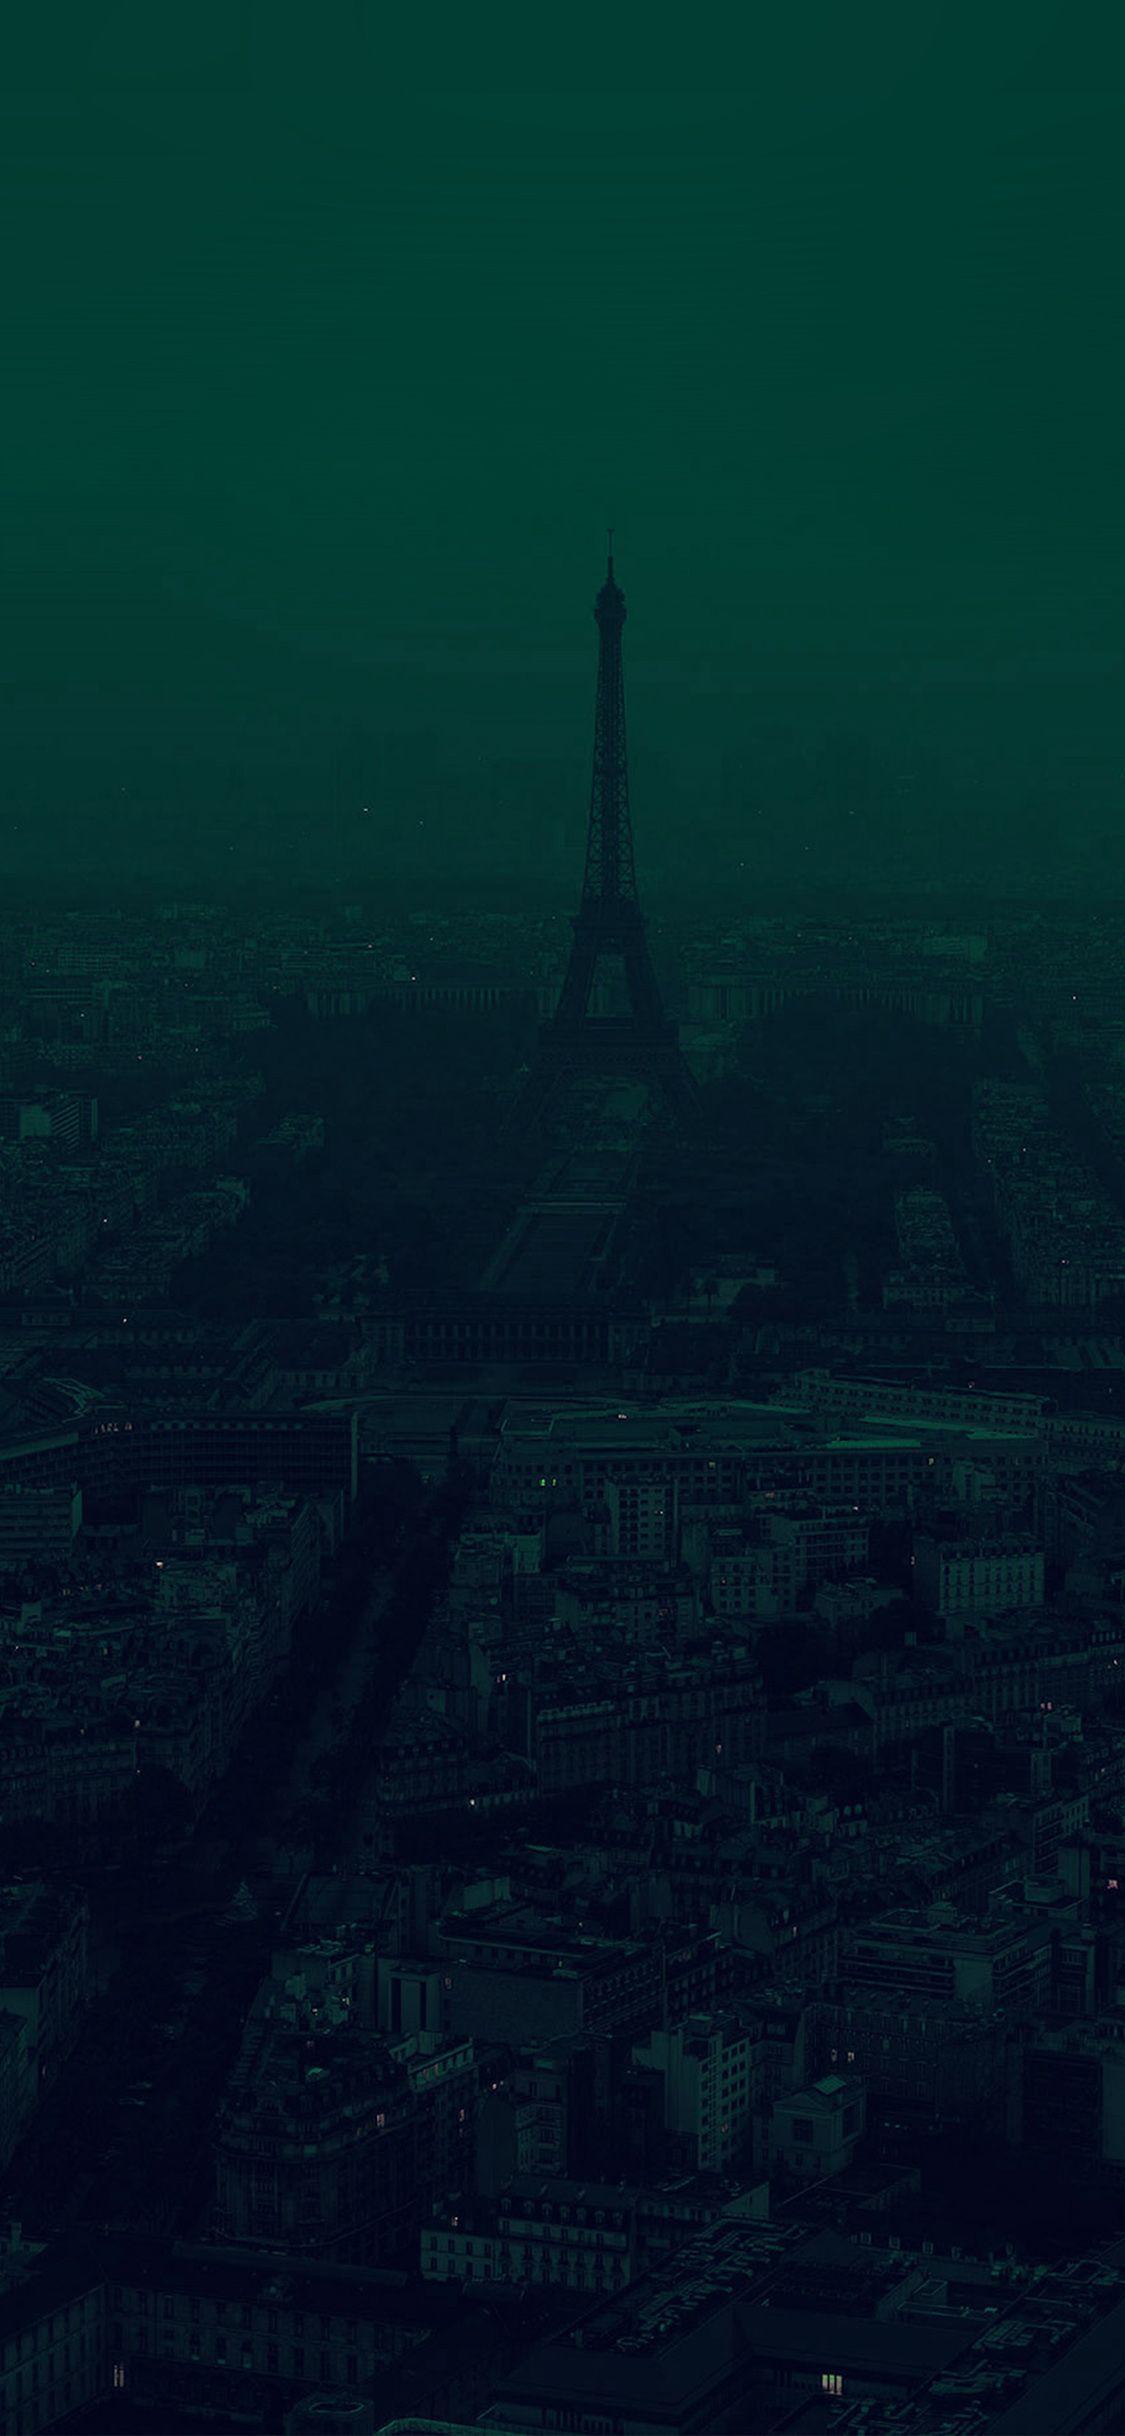 Iphonex Wallpaper Bb44 Paris Dark Green City Illustration Art Dark Green Aesthetic Dark Green Wallpaper Dark Green Background